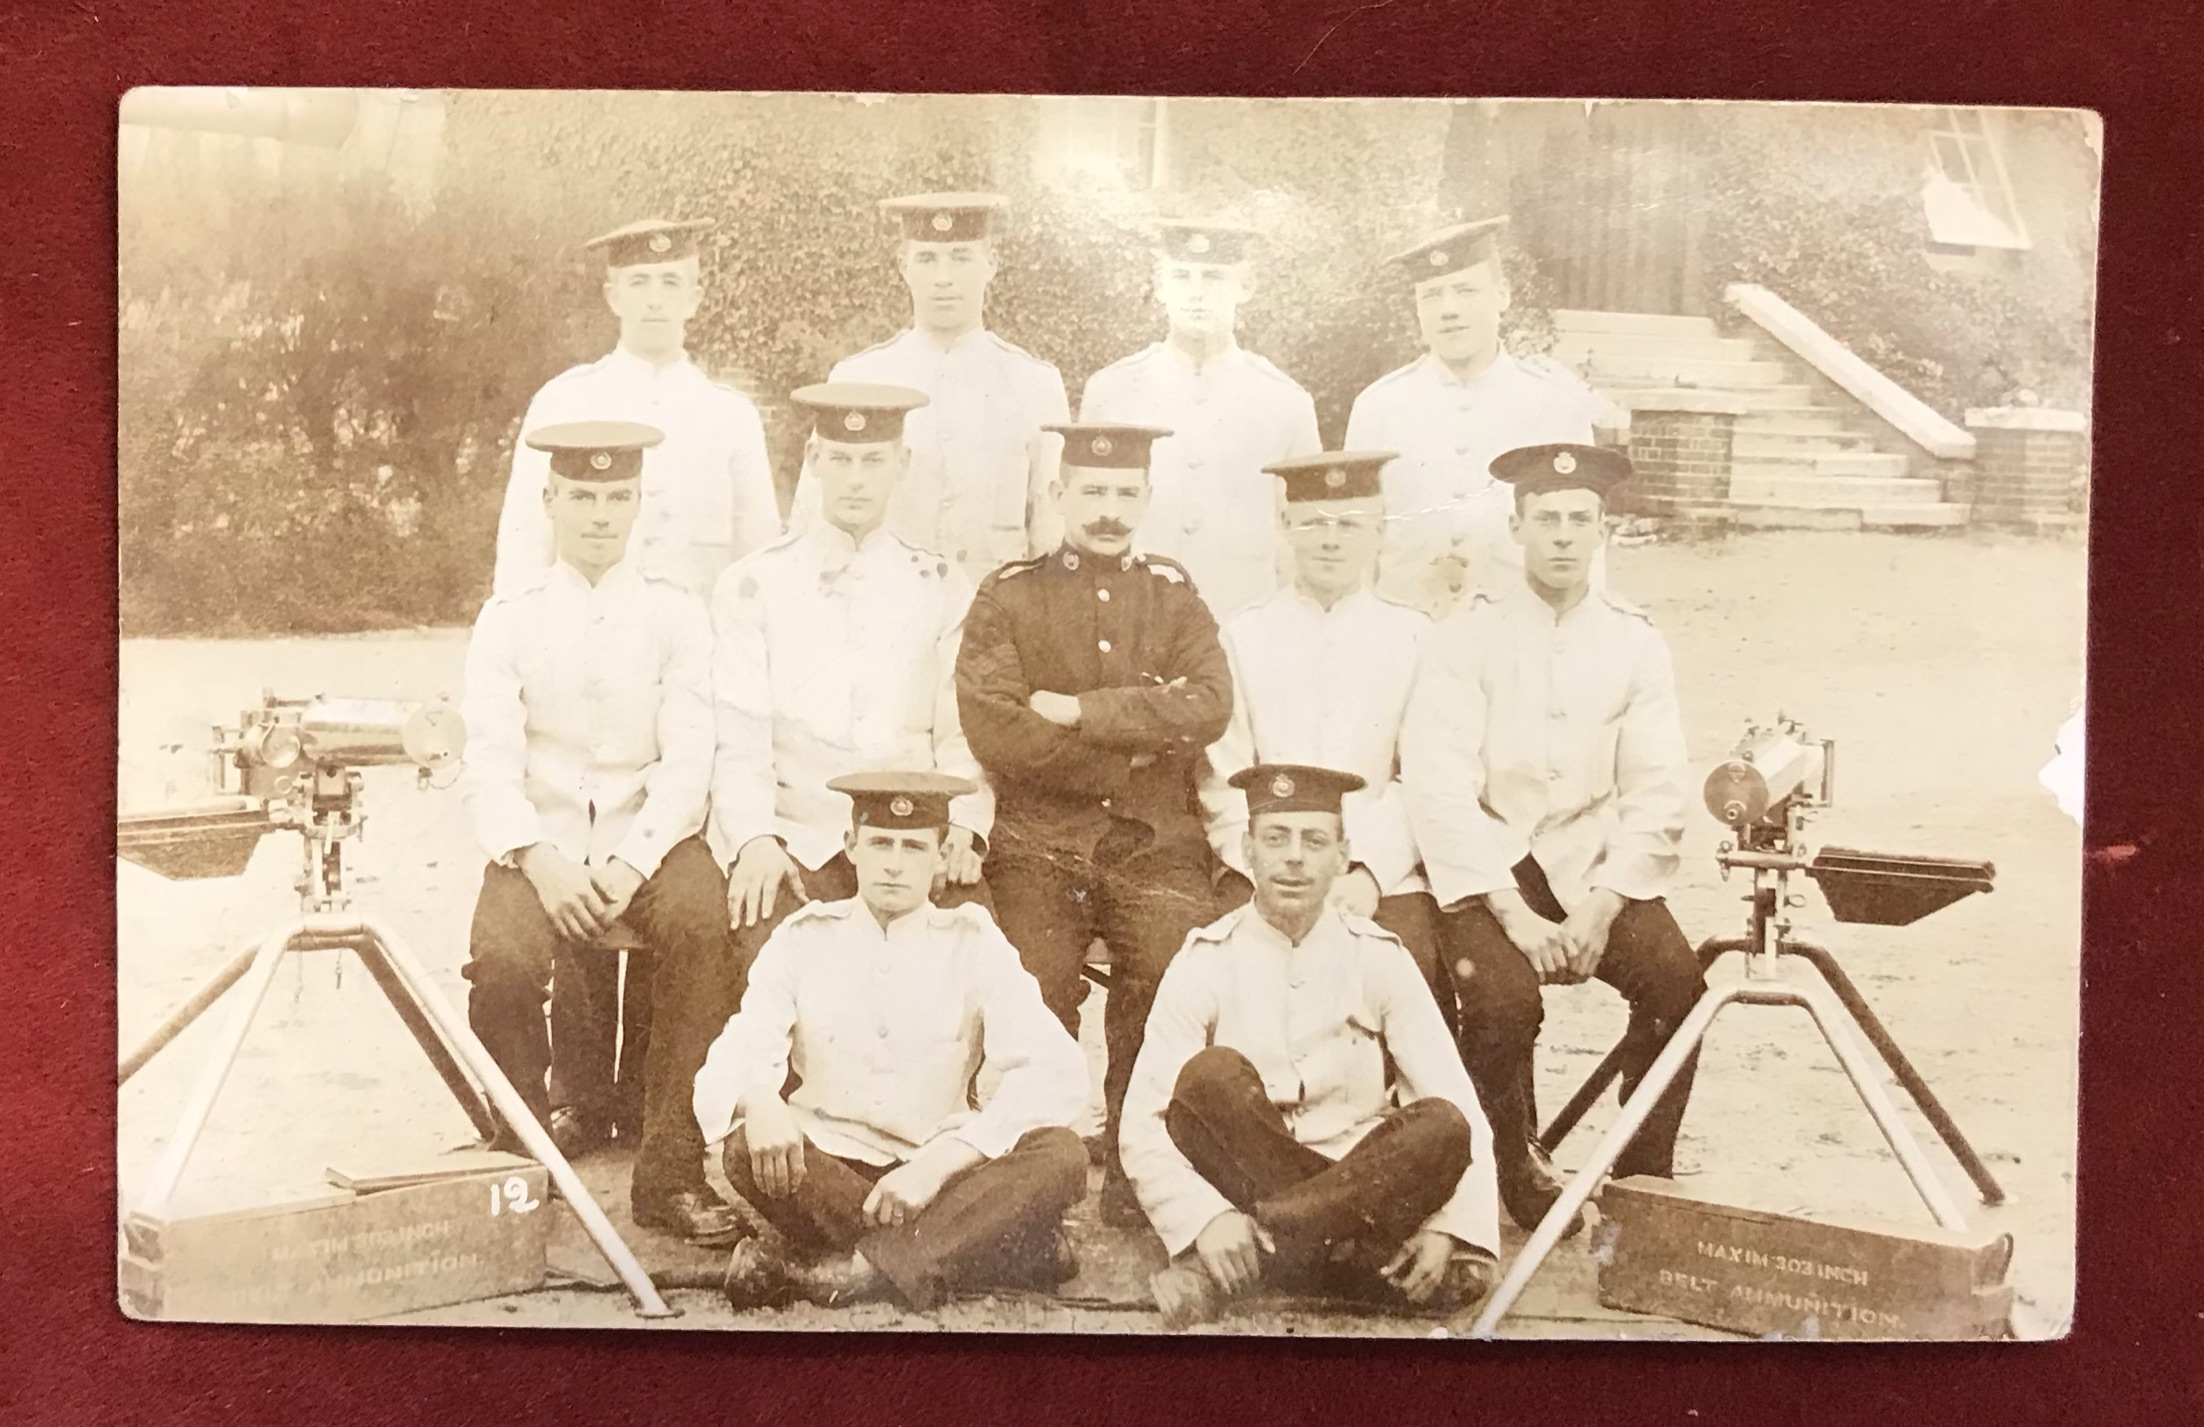 British WWI Royal Marine Light Infantry Corps RP Postcard, showing the crews of a Machine Gun